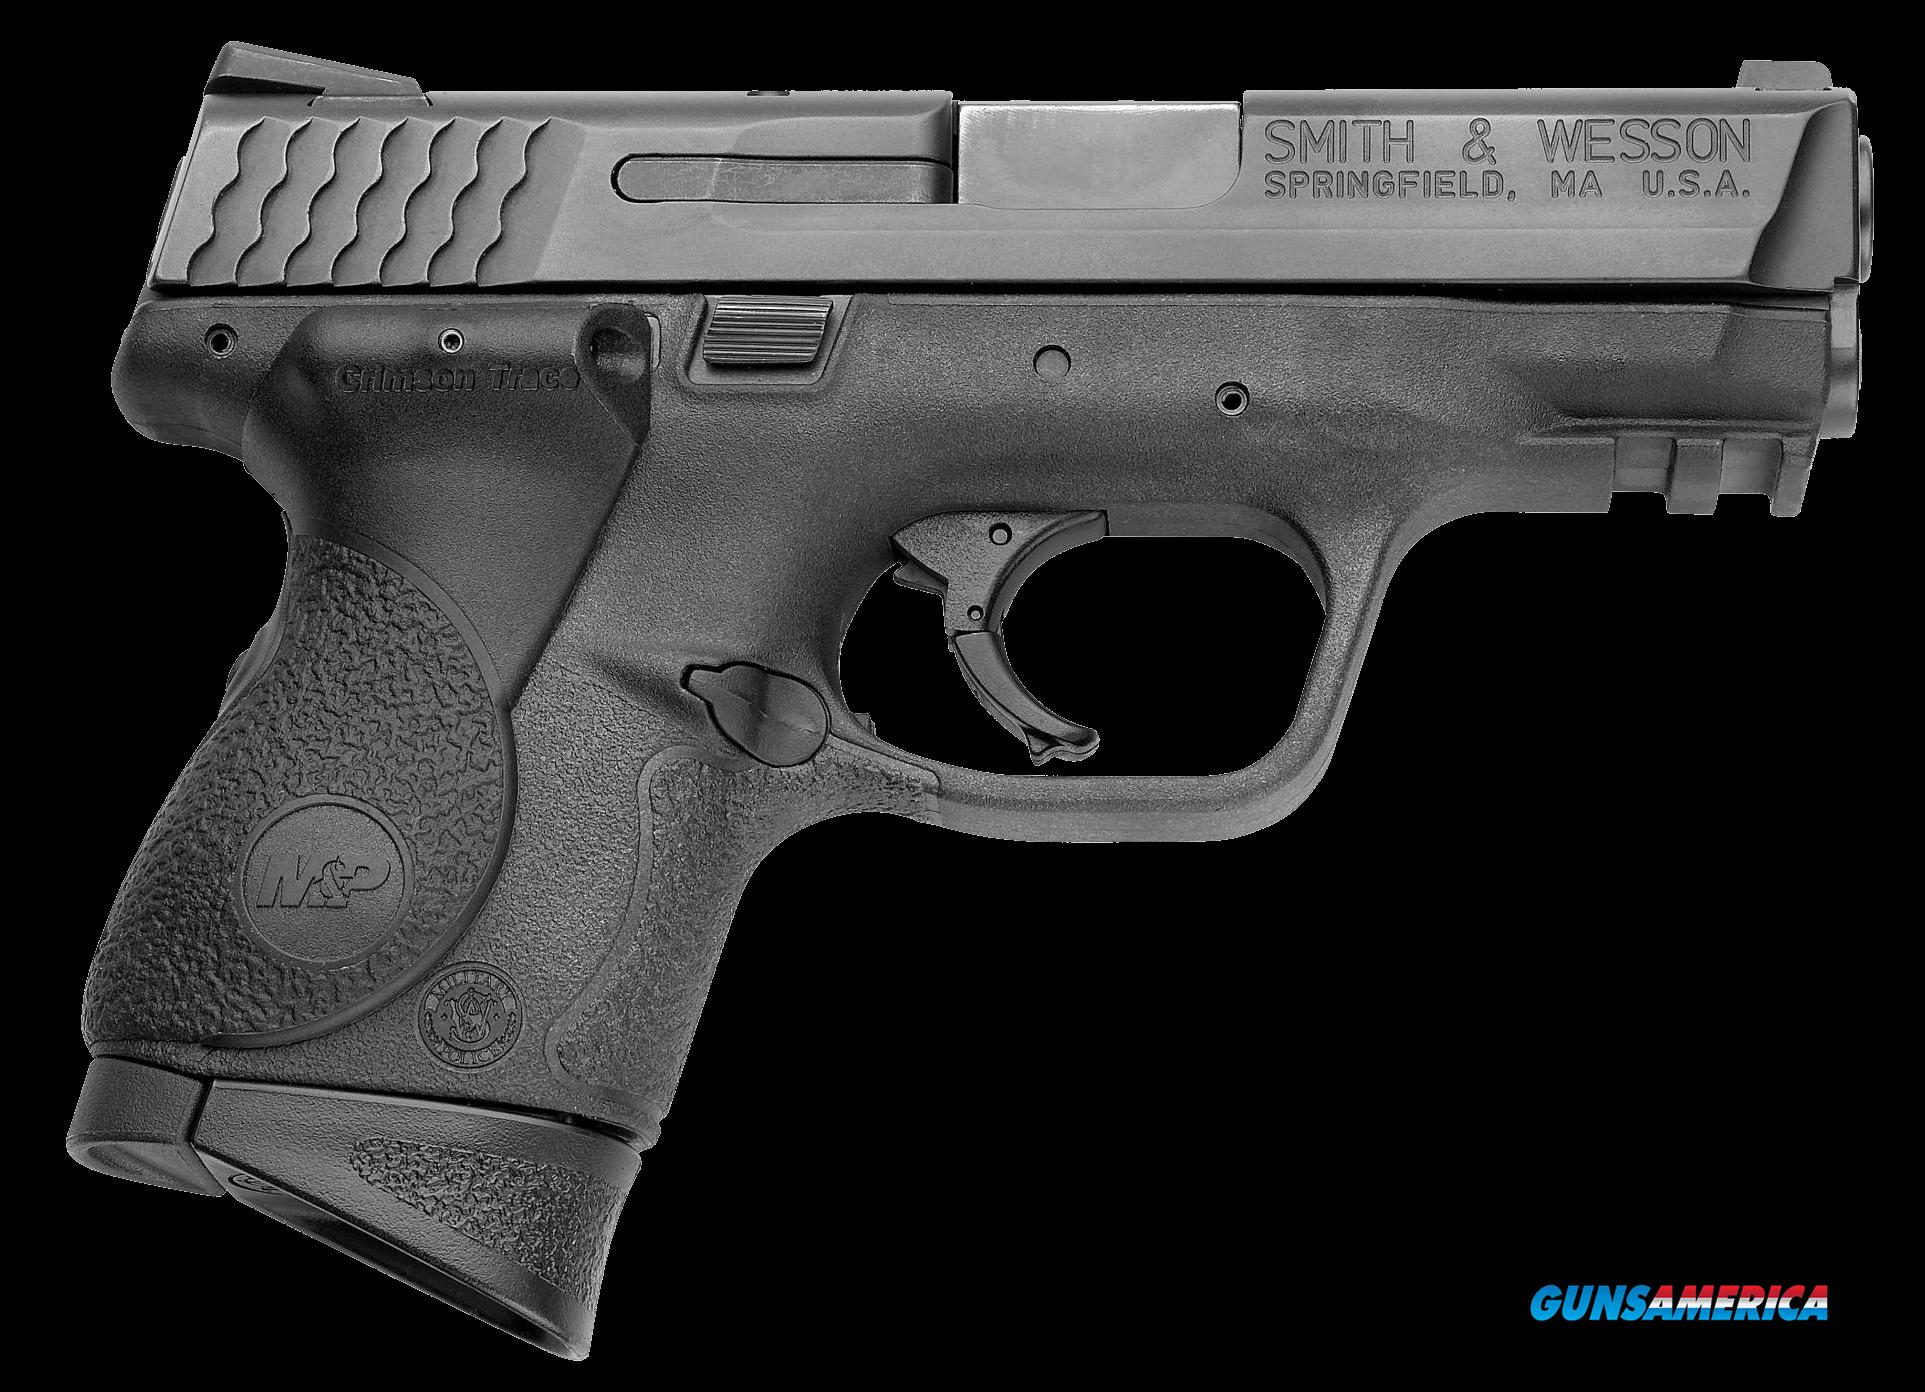 Smith & Wesson M&p 9, S&w M&p9c     220074  9m 3.5 Ct               12r  Guns > Pistols > 1911 Pistol Copies (non-Colt)